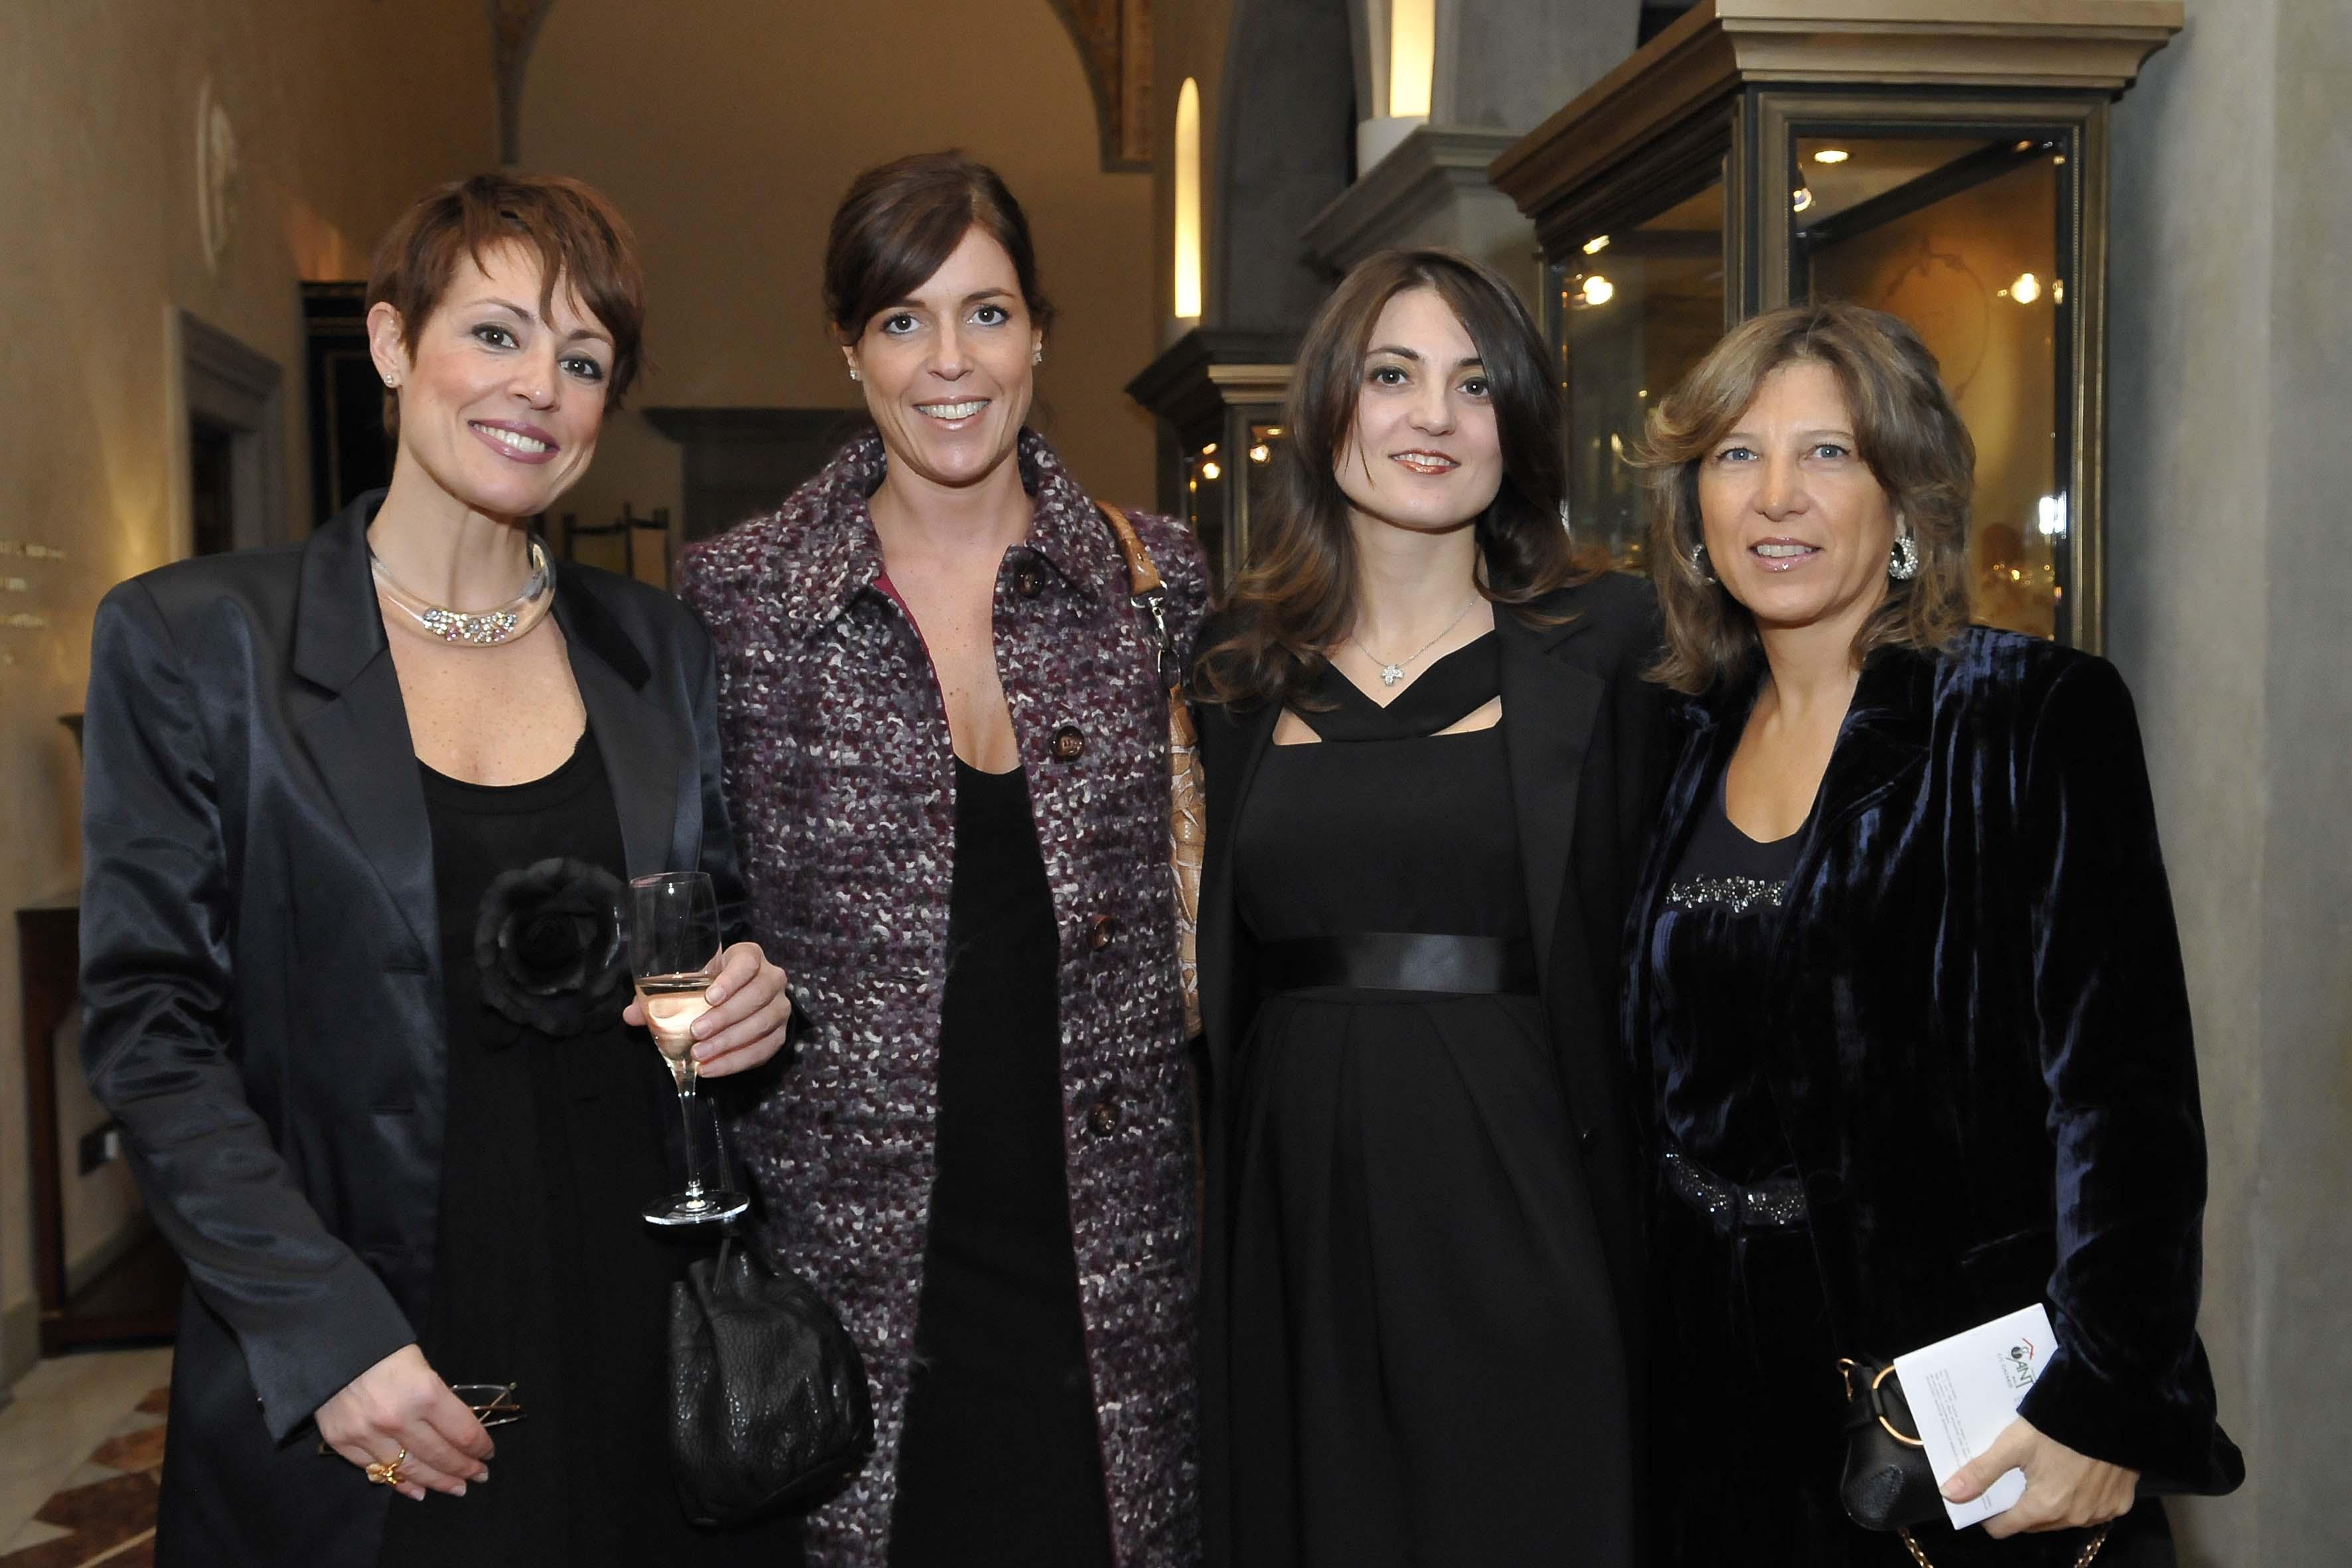 da sx: Cristina Jacomelli,Isabella Jacomelli, Francesca d' Eria, Simona d'Eria